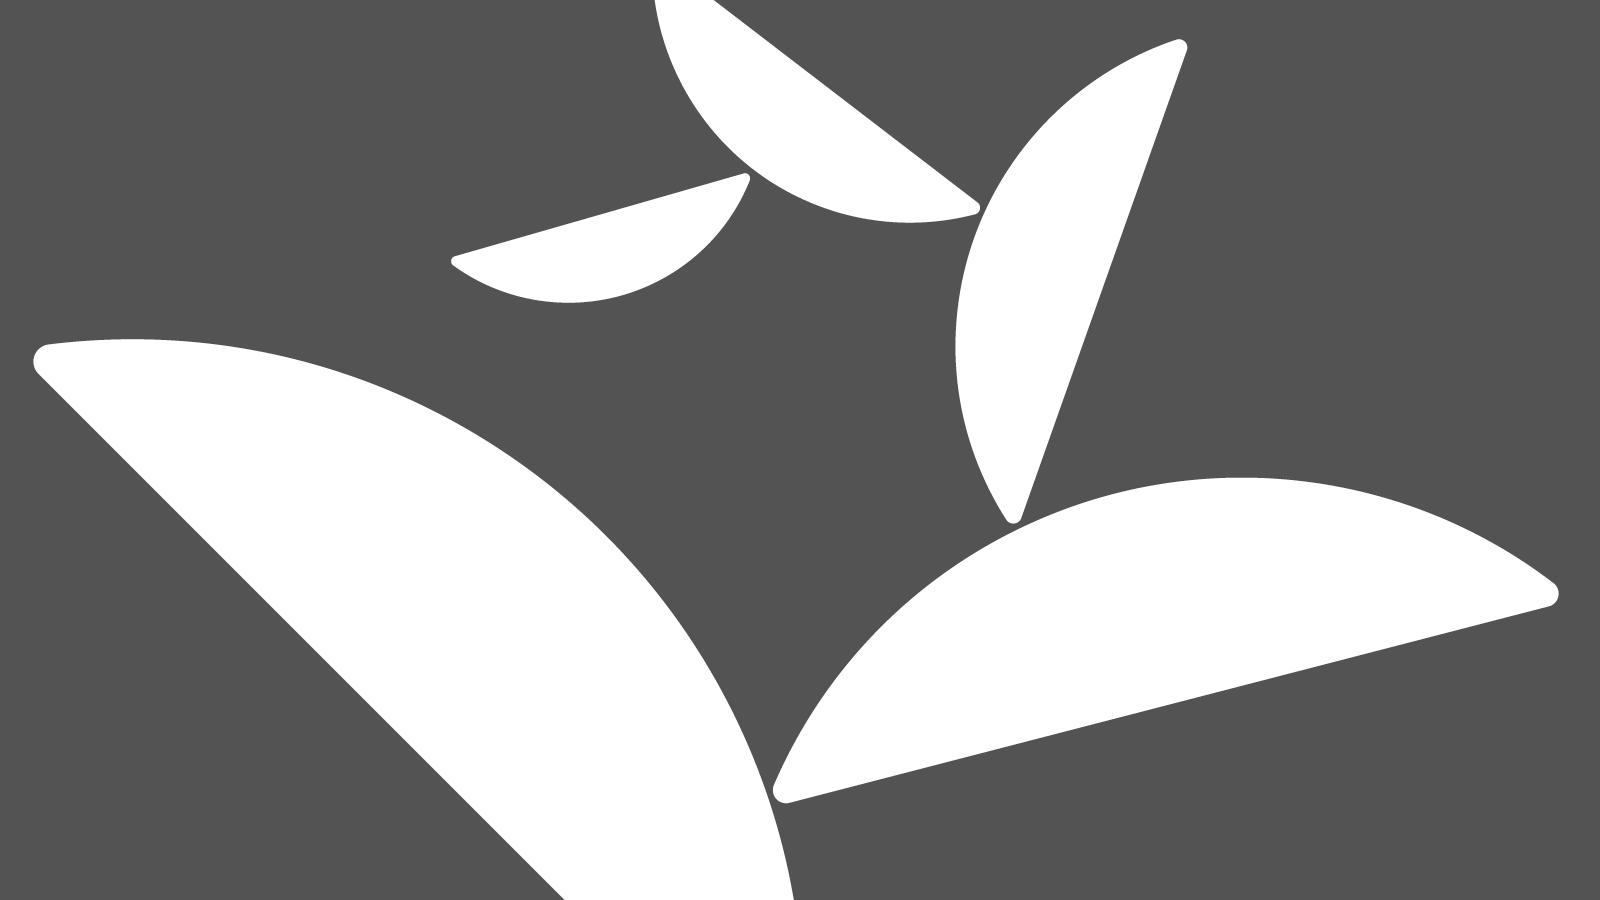 identity-design-logo-gym-gymnastics-british-five-typography-branding-milton-keynes-3